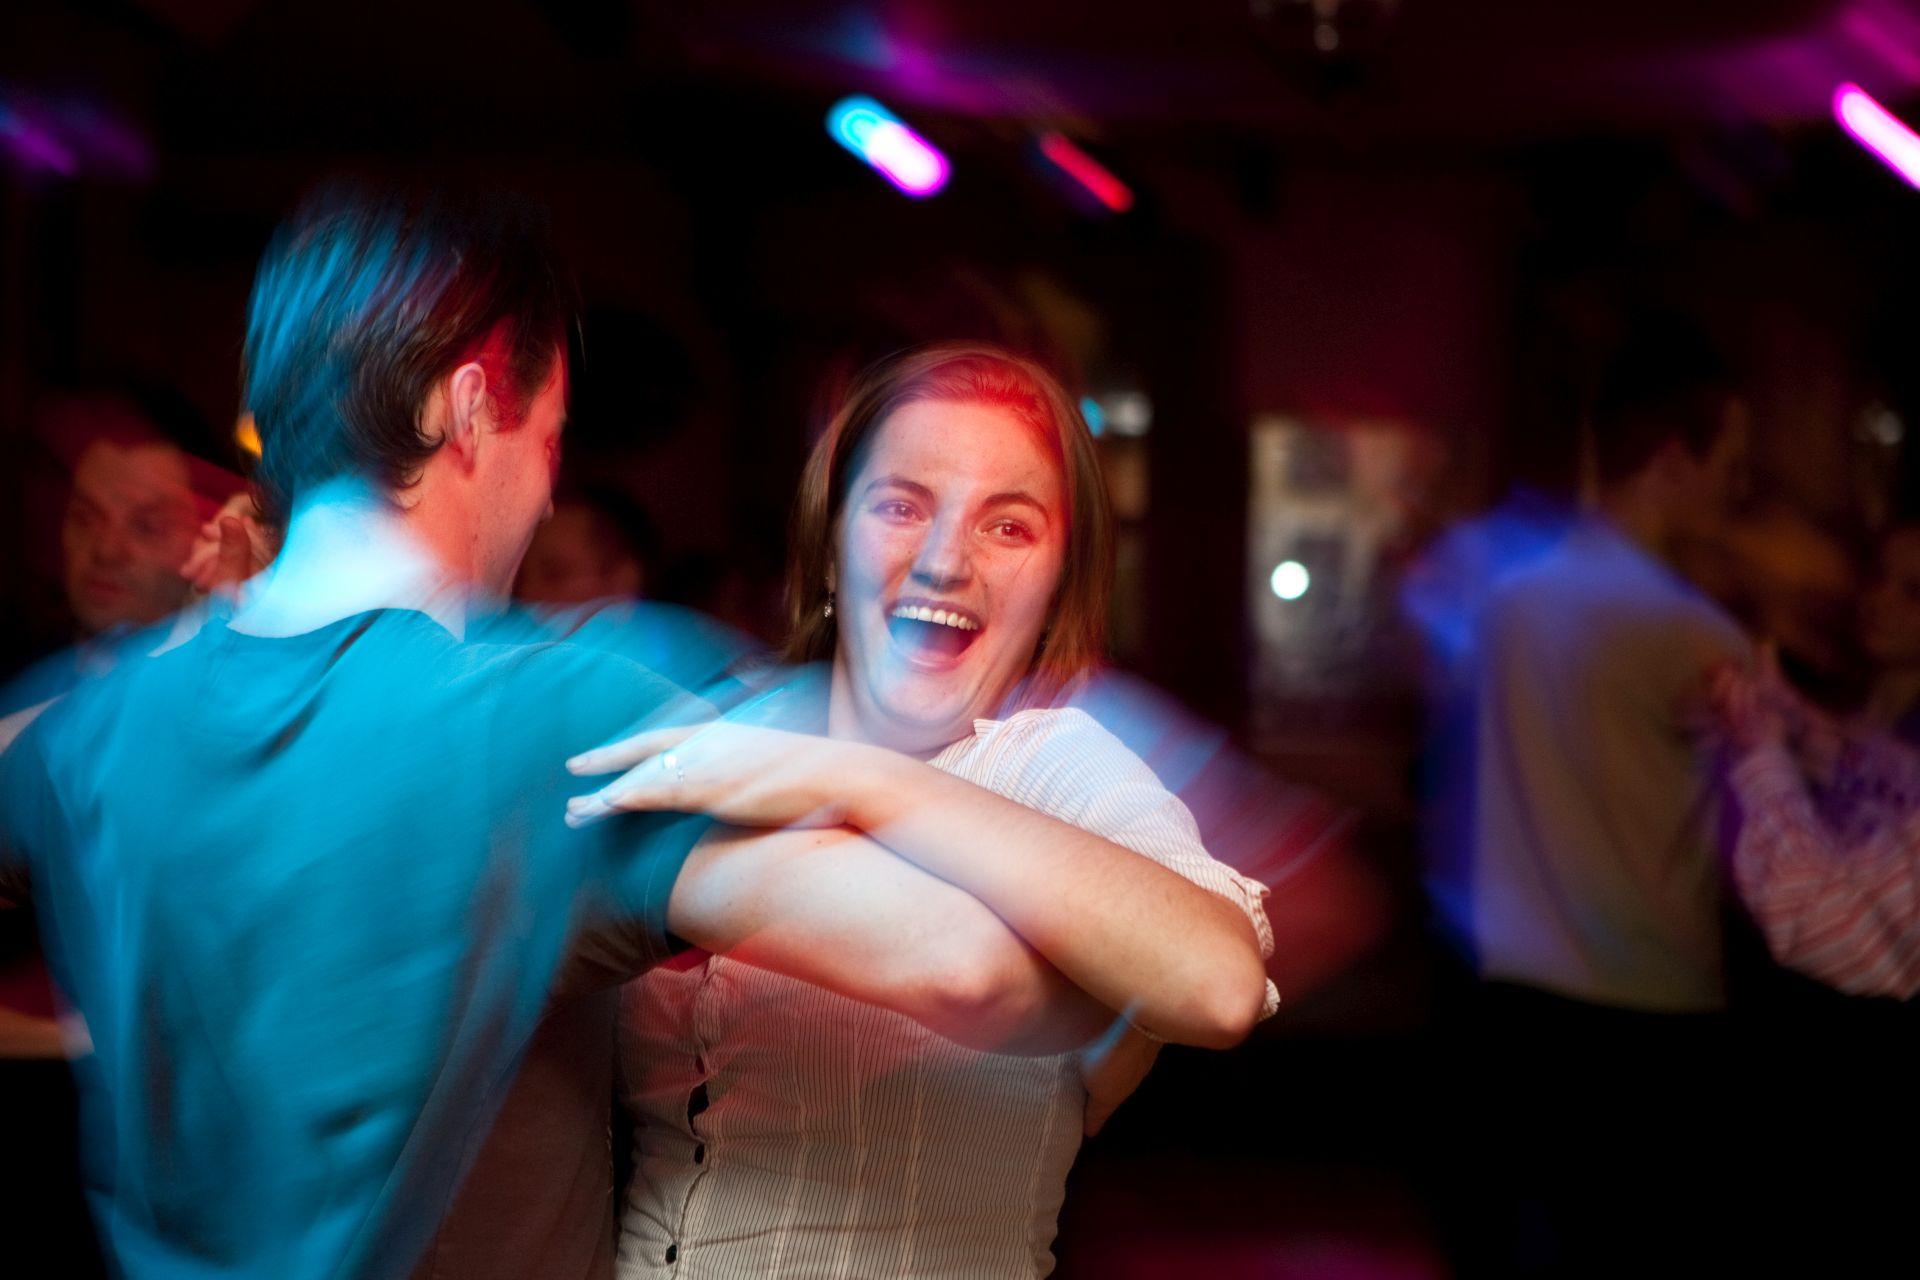 E1 Concert en feest Dansen bij Kluver-11